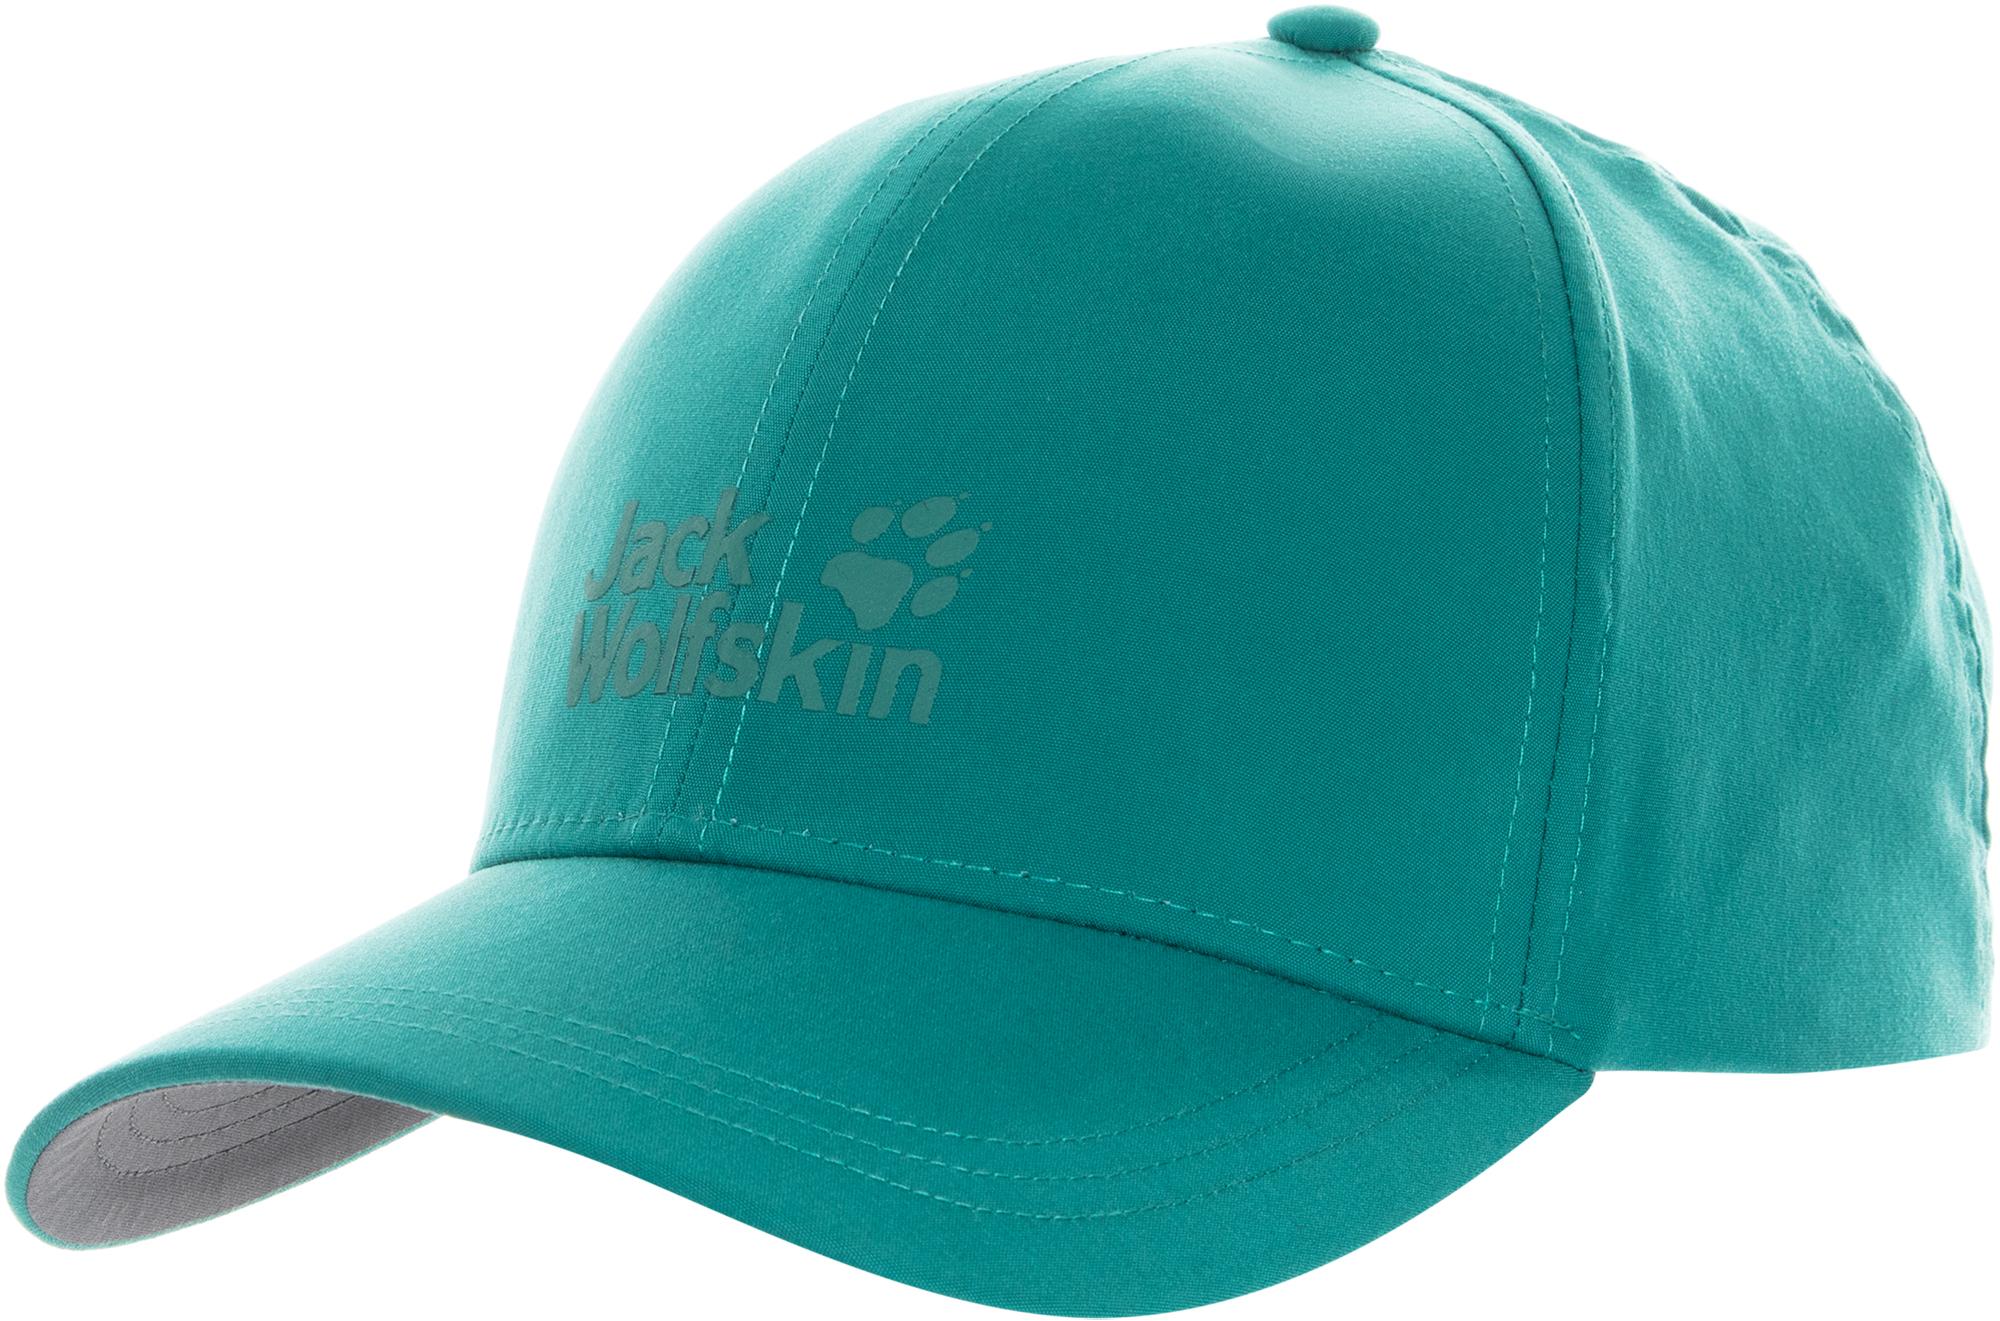 JACK WOLFSKIN Бейсболка Jack Wolfskin Summer Storm, размер 54-57 jack wolfskin шапка diamond knit cap k